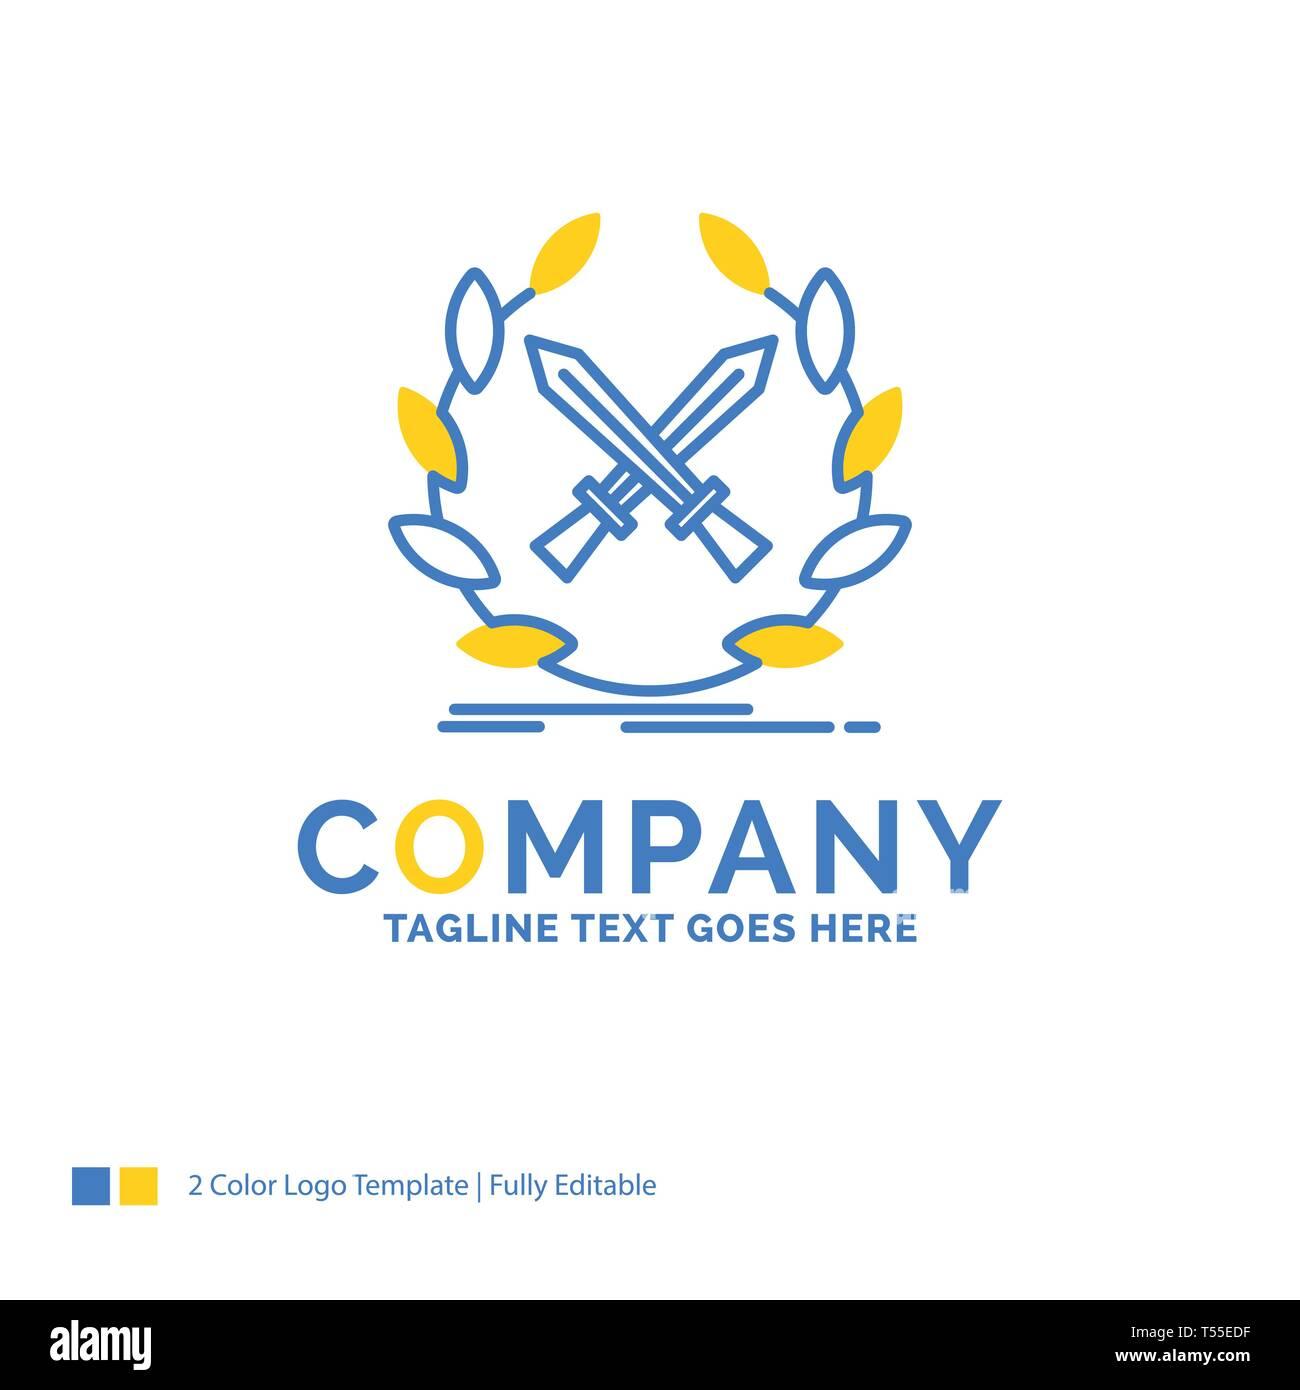 battle, emblem, game, label, swords Blue Yellow Business Logo template. Creative Design Template Place for Tagline. - Stock Image